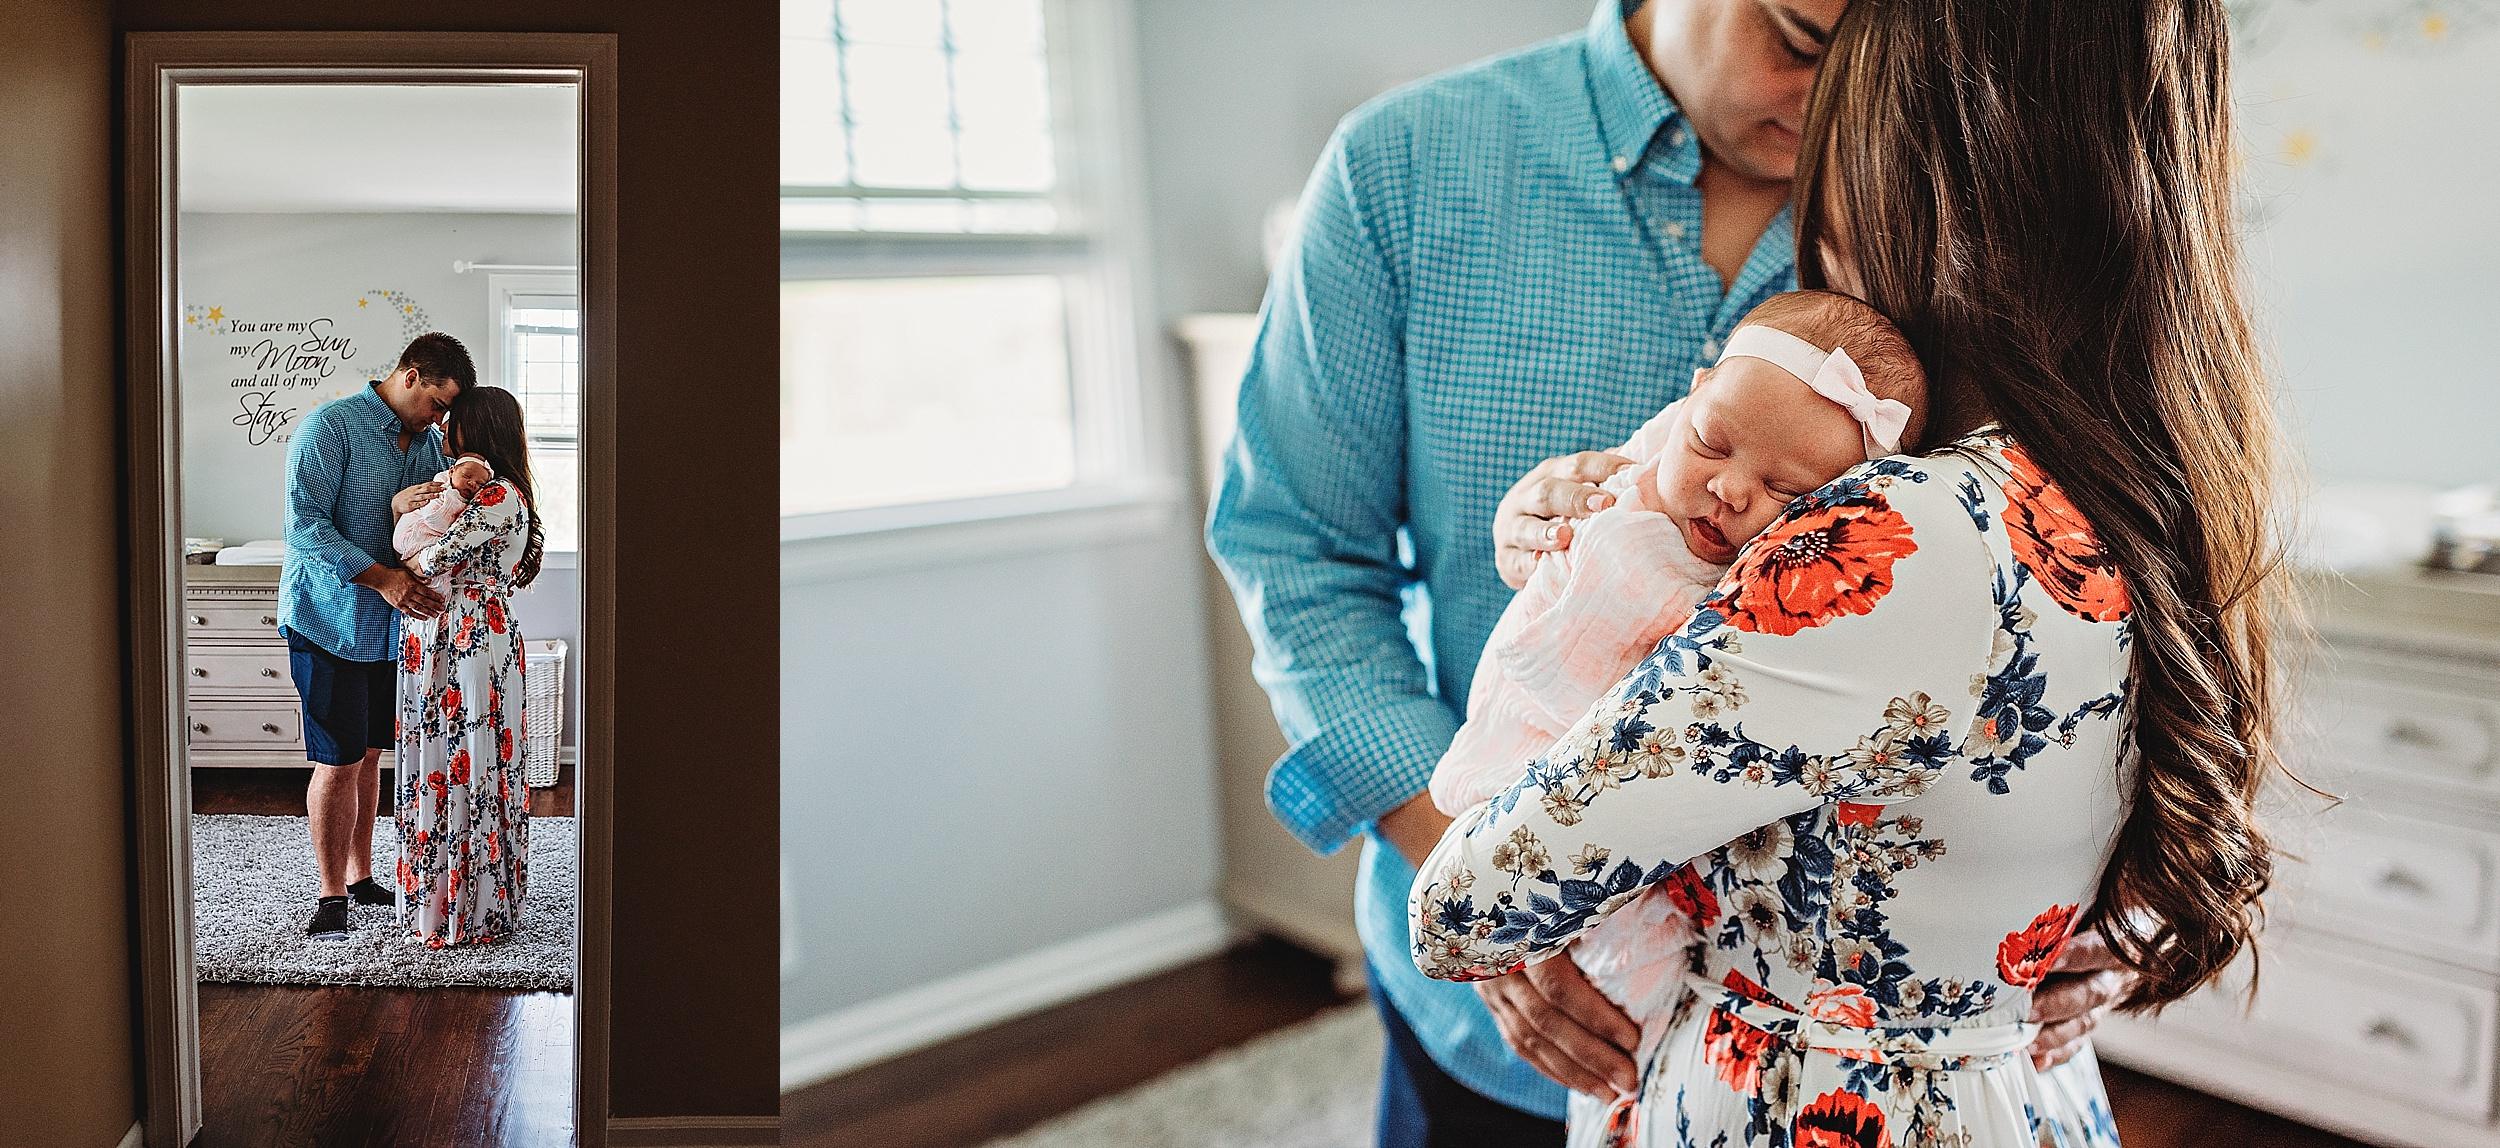 lauren-grayson-photography-akron-cleveland-ohio-photographer-family-newborn-home-photo-session-grace-a_0295.jpg